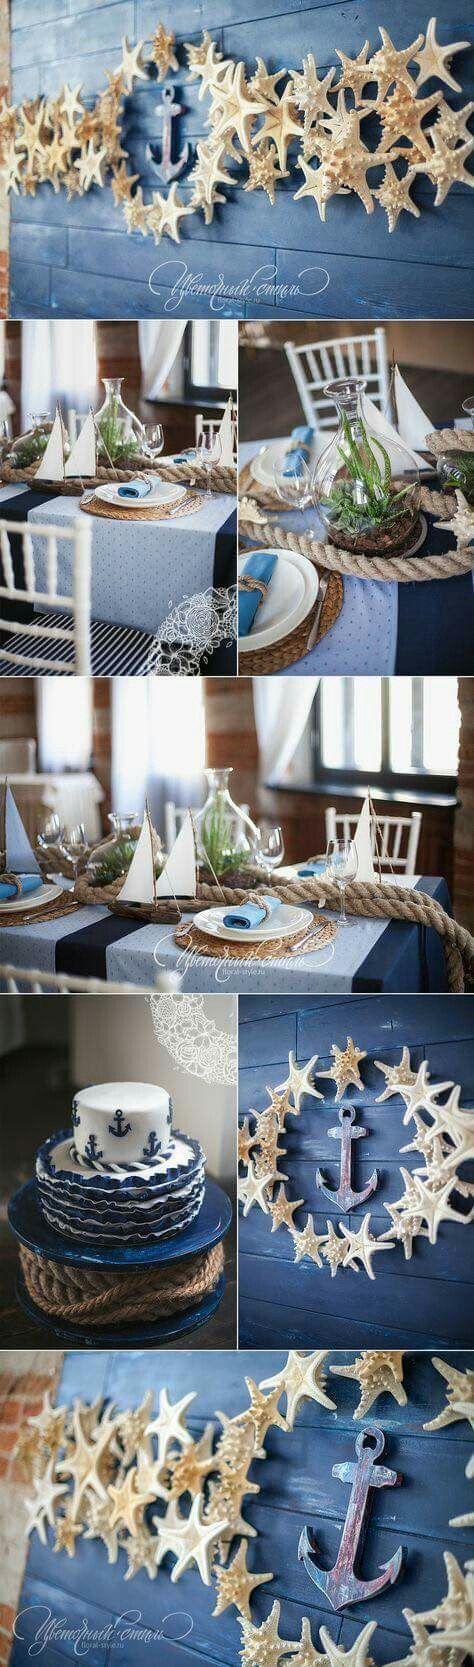 Under the sea wedding decoration ideas  Pin by kris erdman on By the beautiful SEA  Pinterest  Coastal